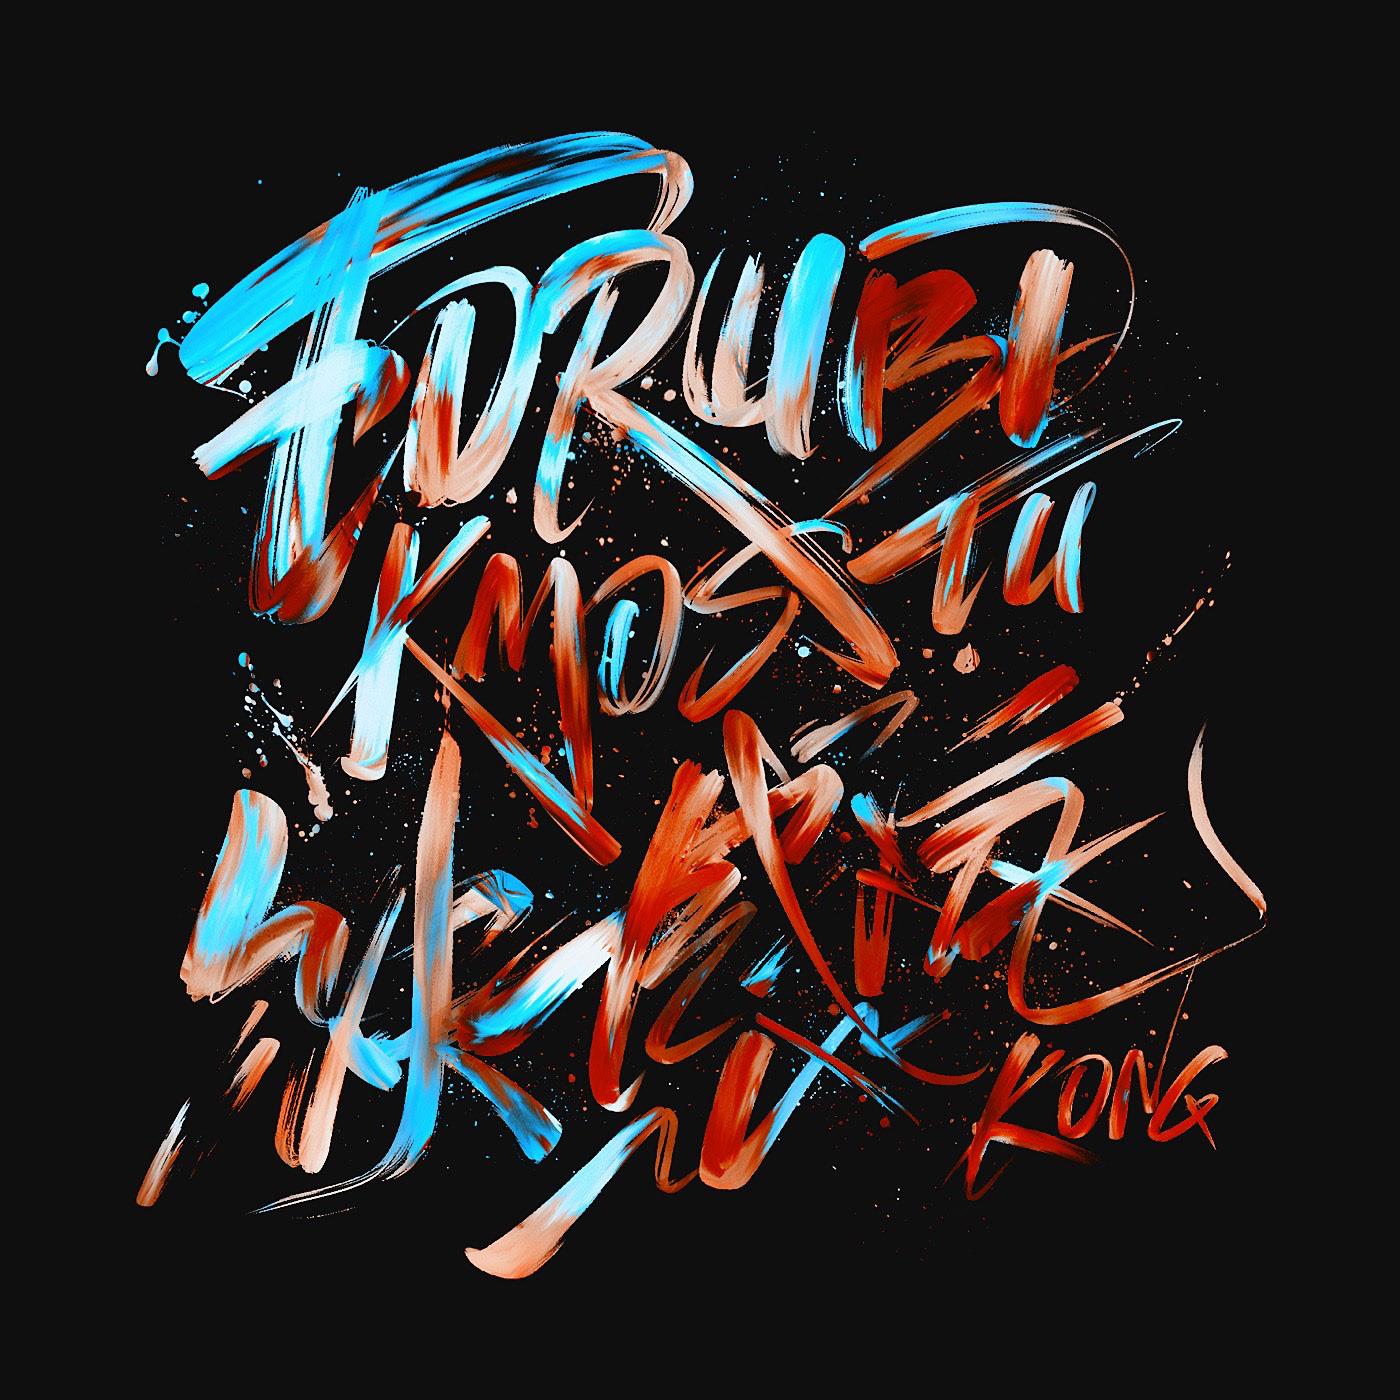 Graphic Design,Typography,Street Art